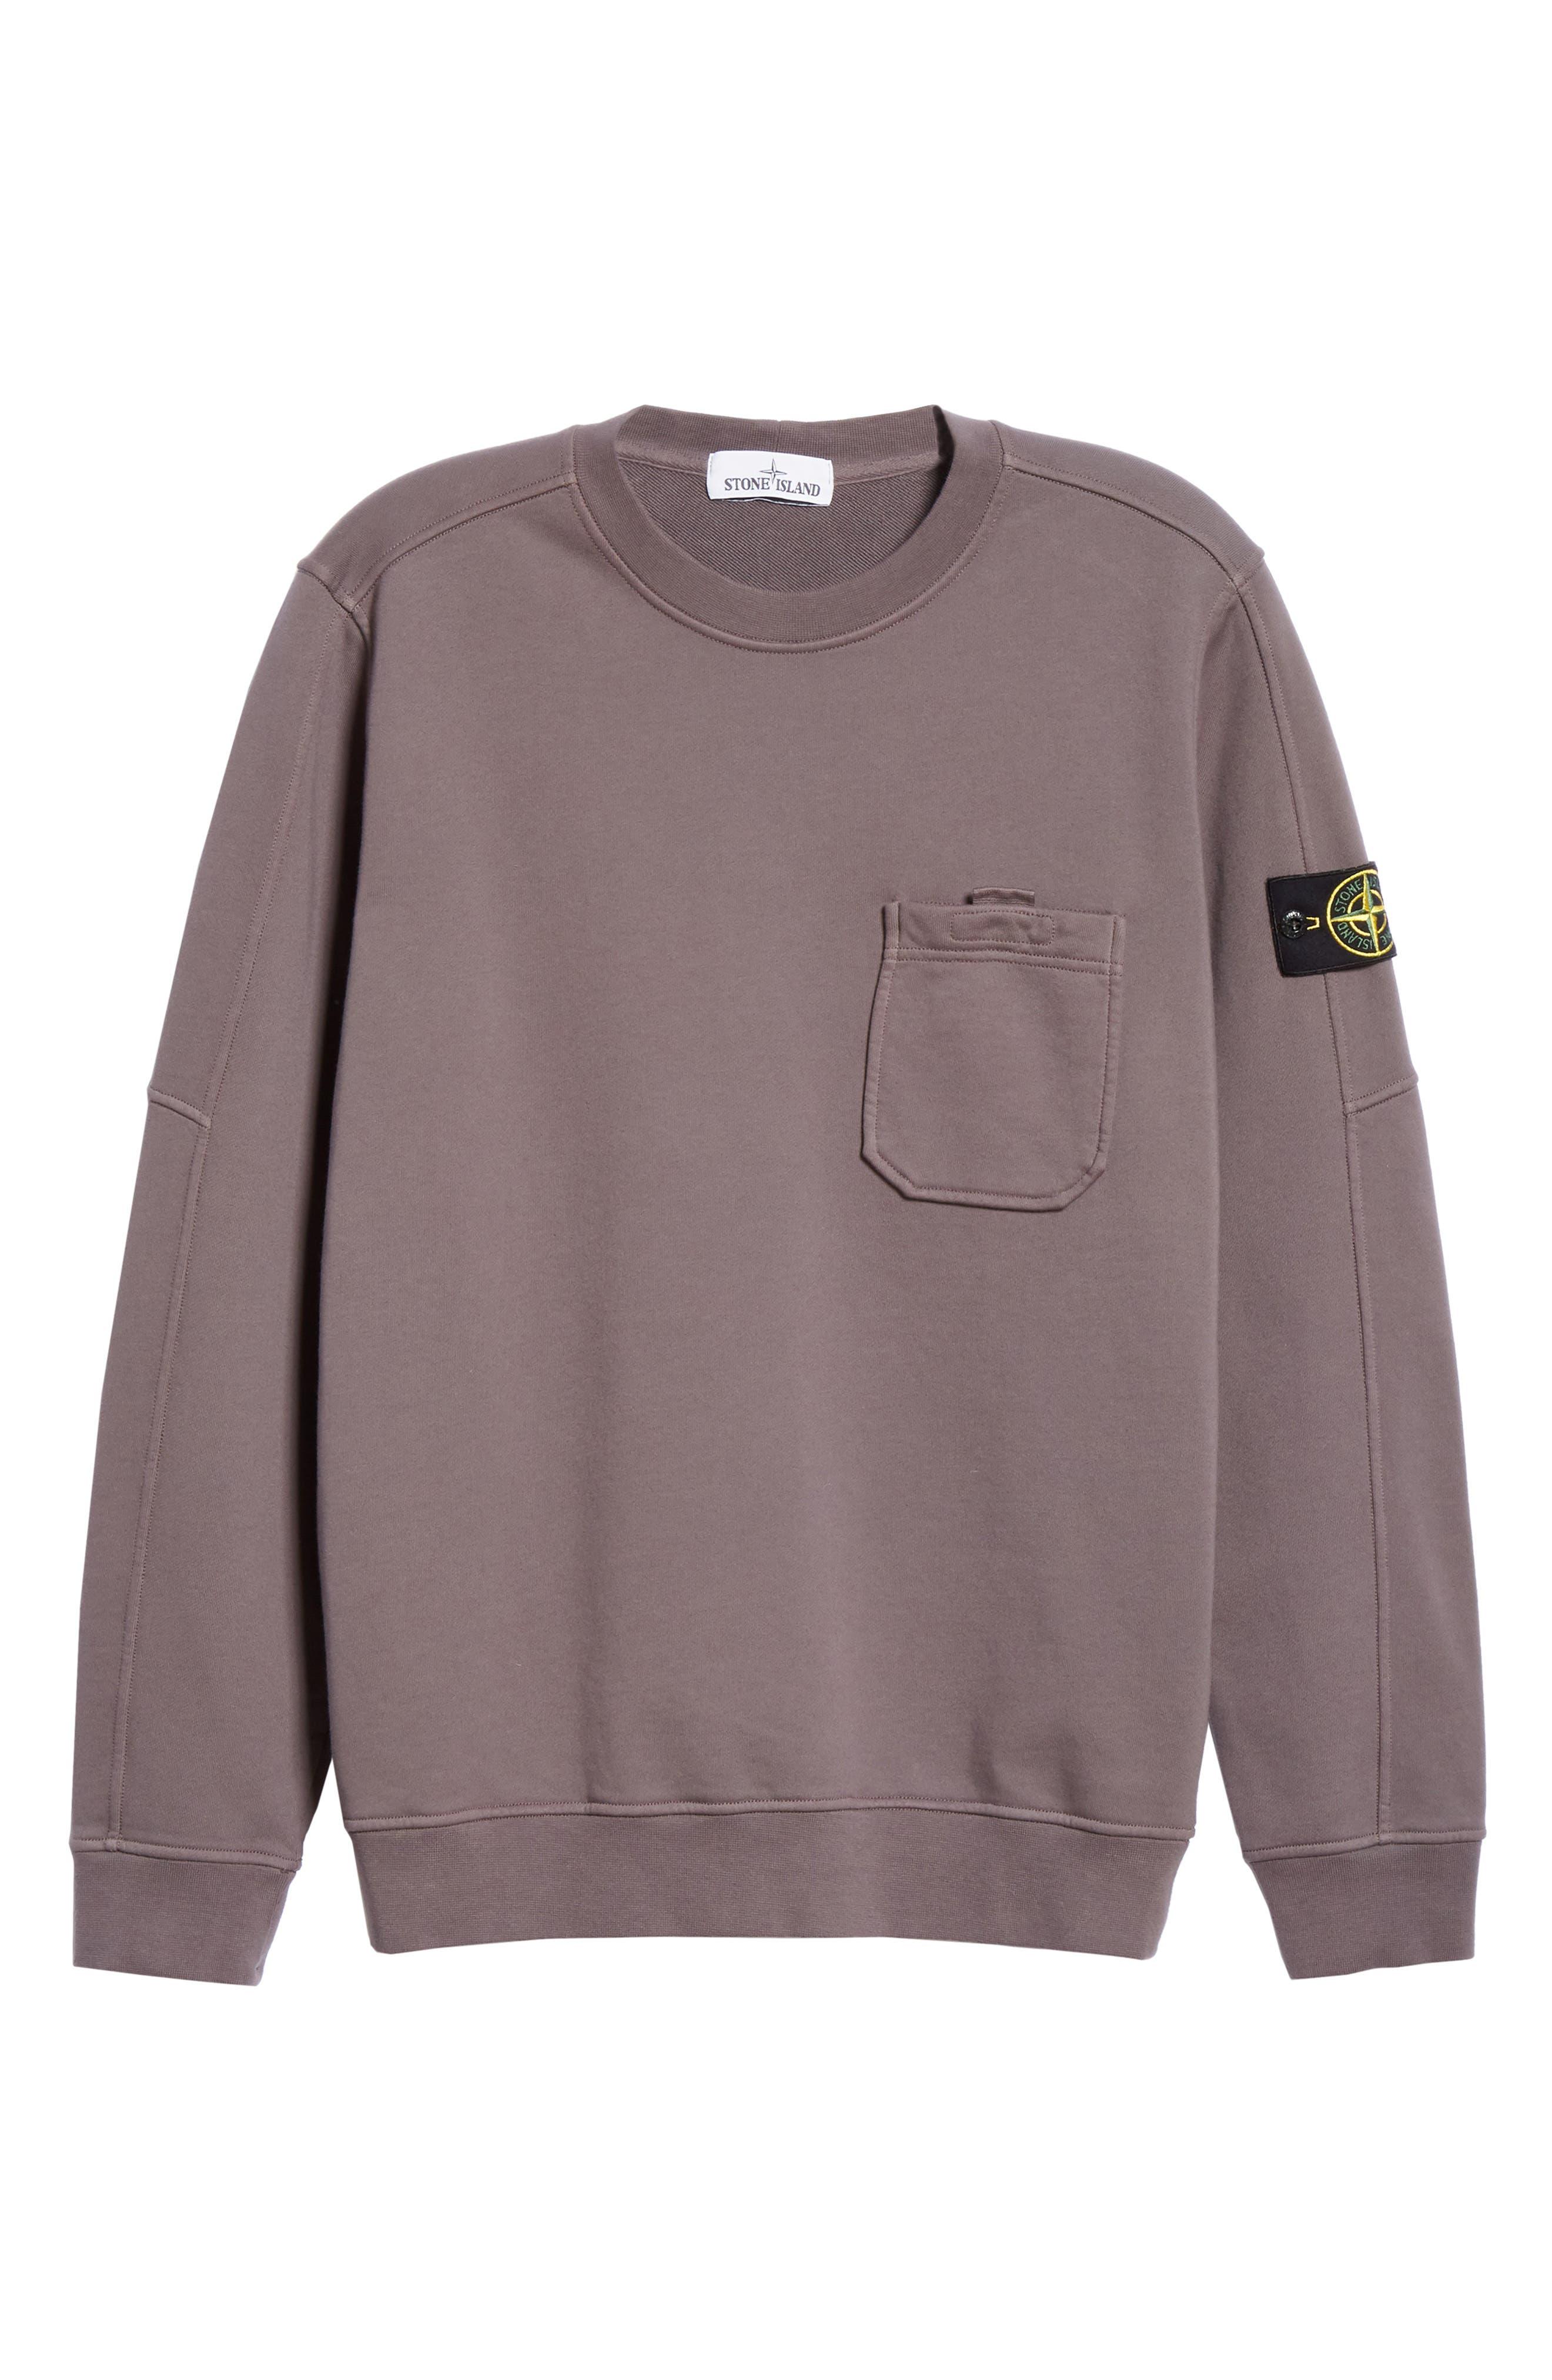 STONE ISLAND,                             Pocket Sweatshirt,                             Alternate thumbnail 6, color,                             BLUE